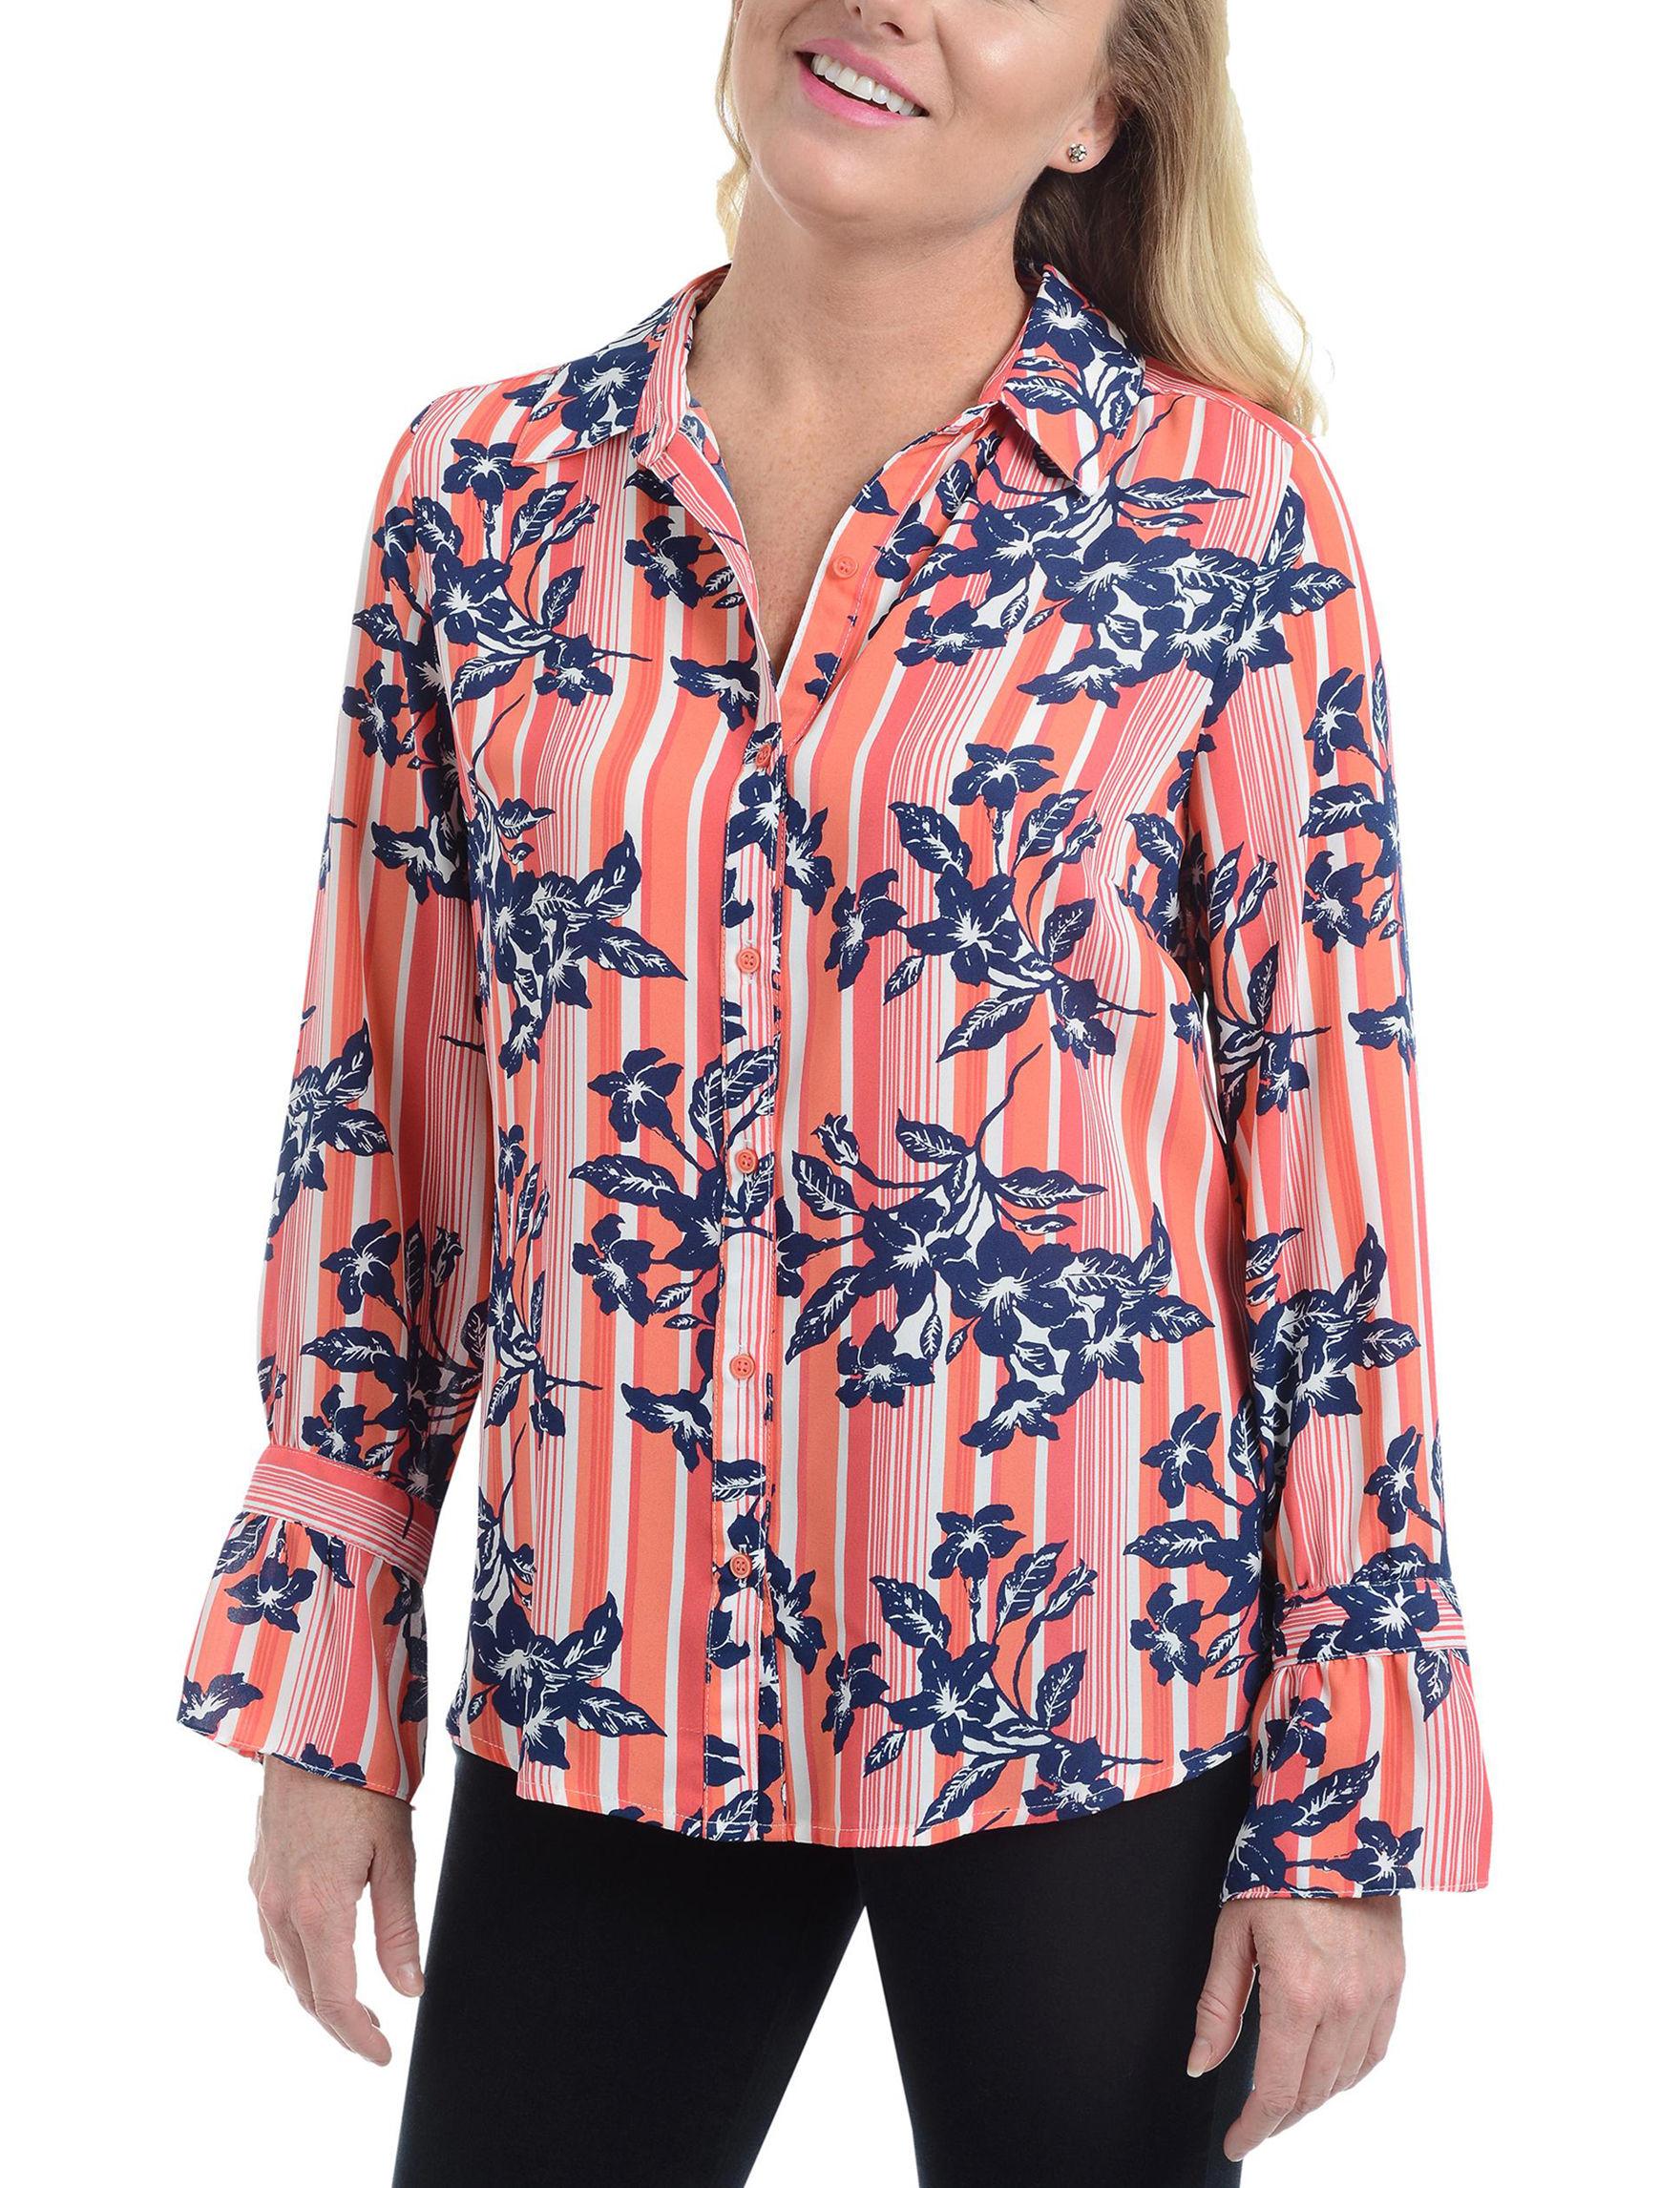 NY Collection Orange Multi Shirts & Blouses